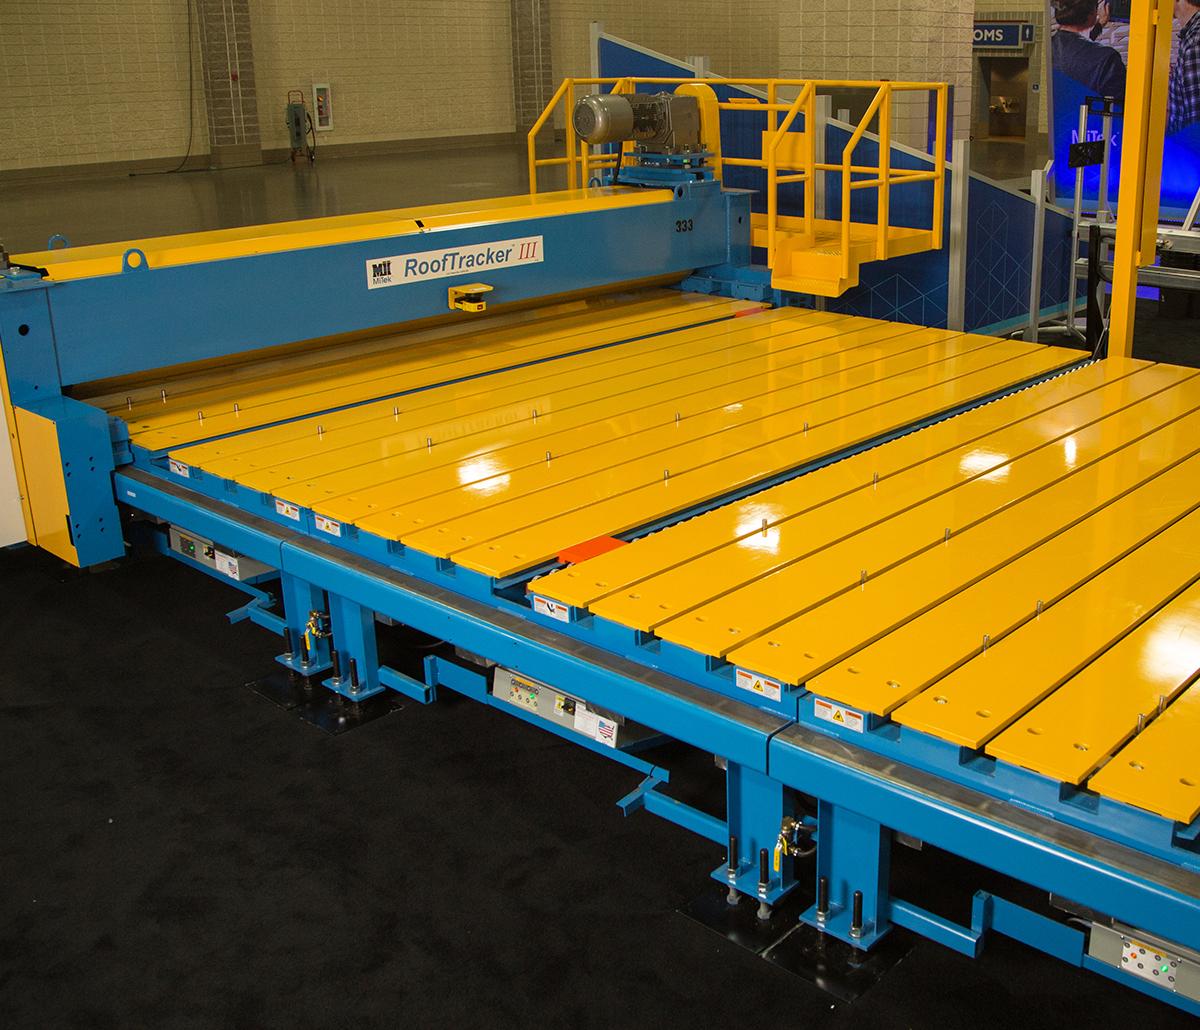 MiTek Rooftracker III Roller Gantry Automated Solutions - Rooftracker III in facility